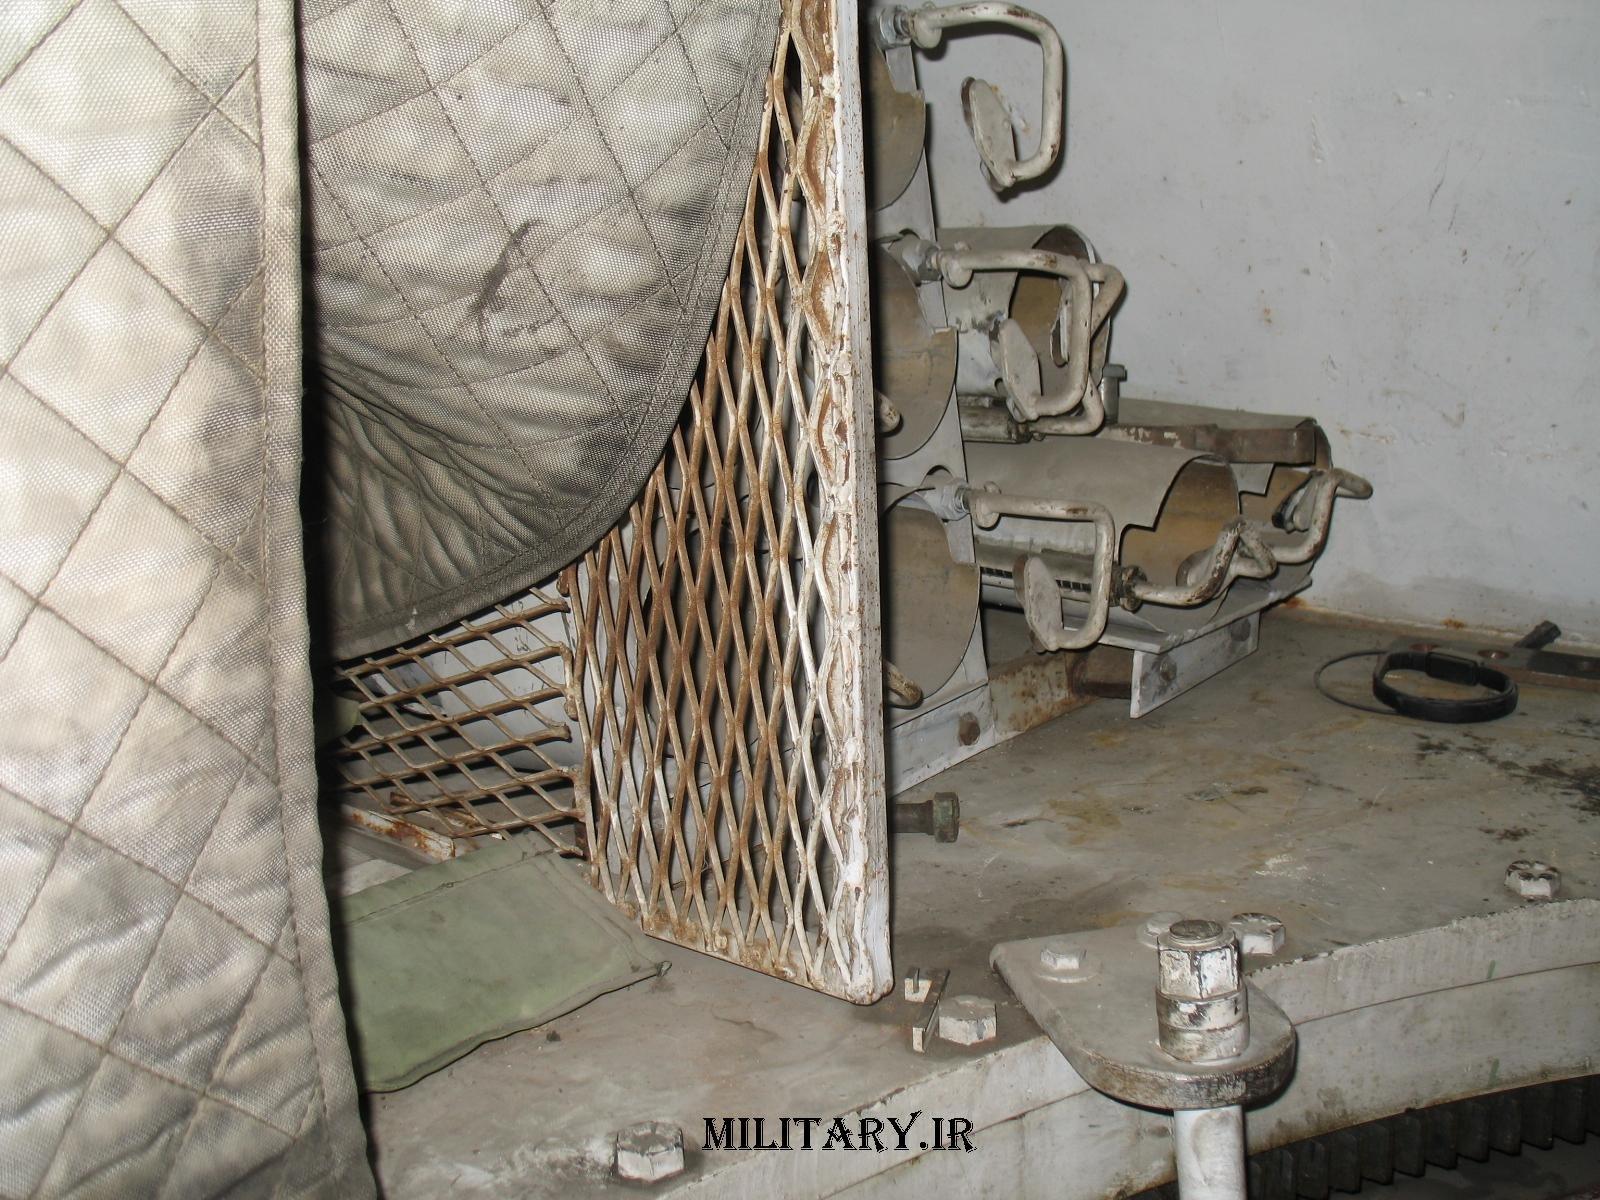 http://gallery.military.ir/albums/userpics/Zulfiqar1_%2819%29.JPG